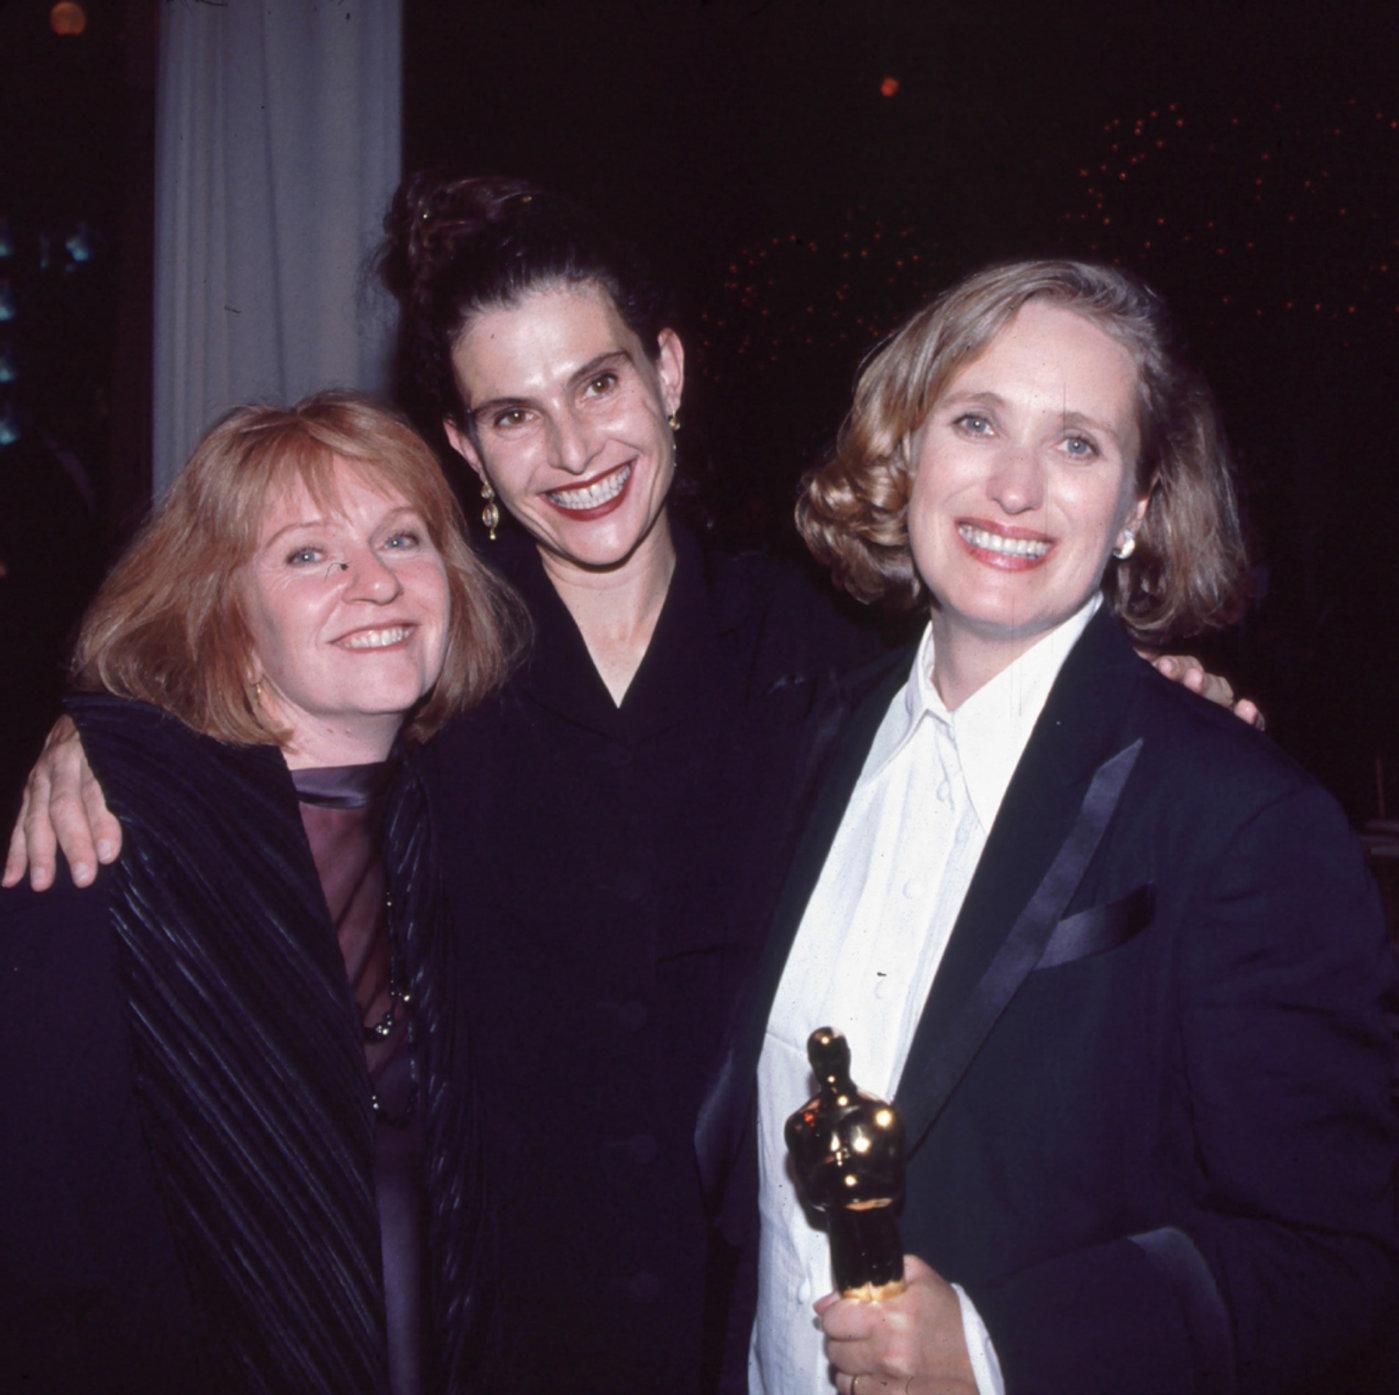 Jan Chapman、Janet Patterson 和 Jane Campion在1993年的合影 Photo by BEI/REX/Shutterstock 来源:《综艺》